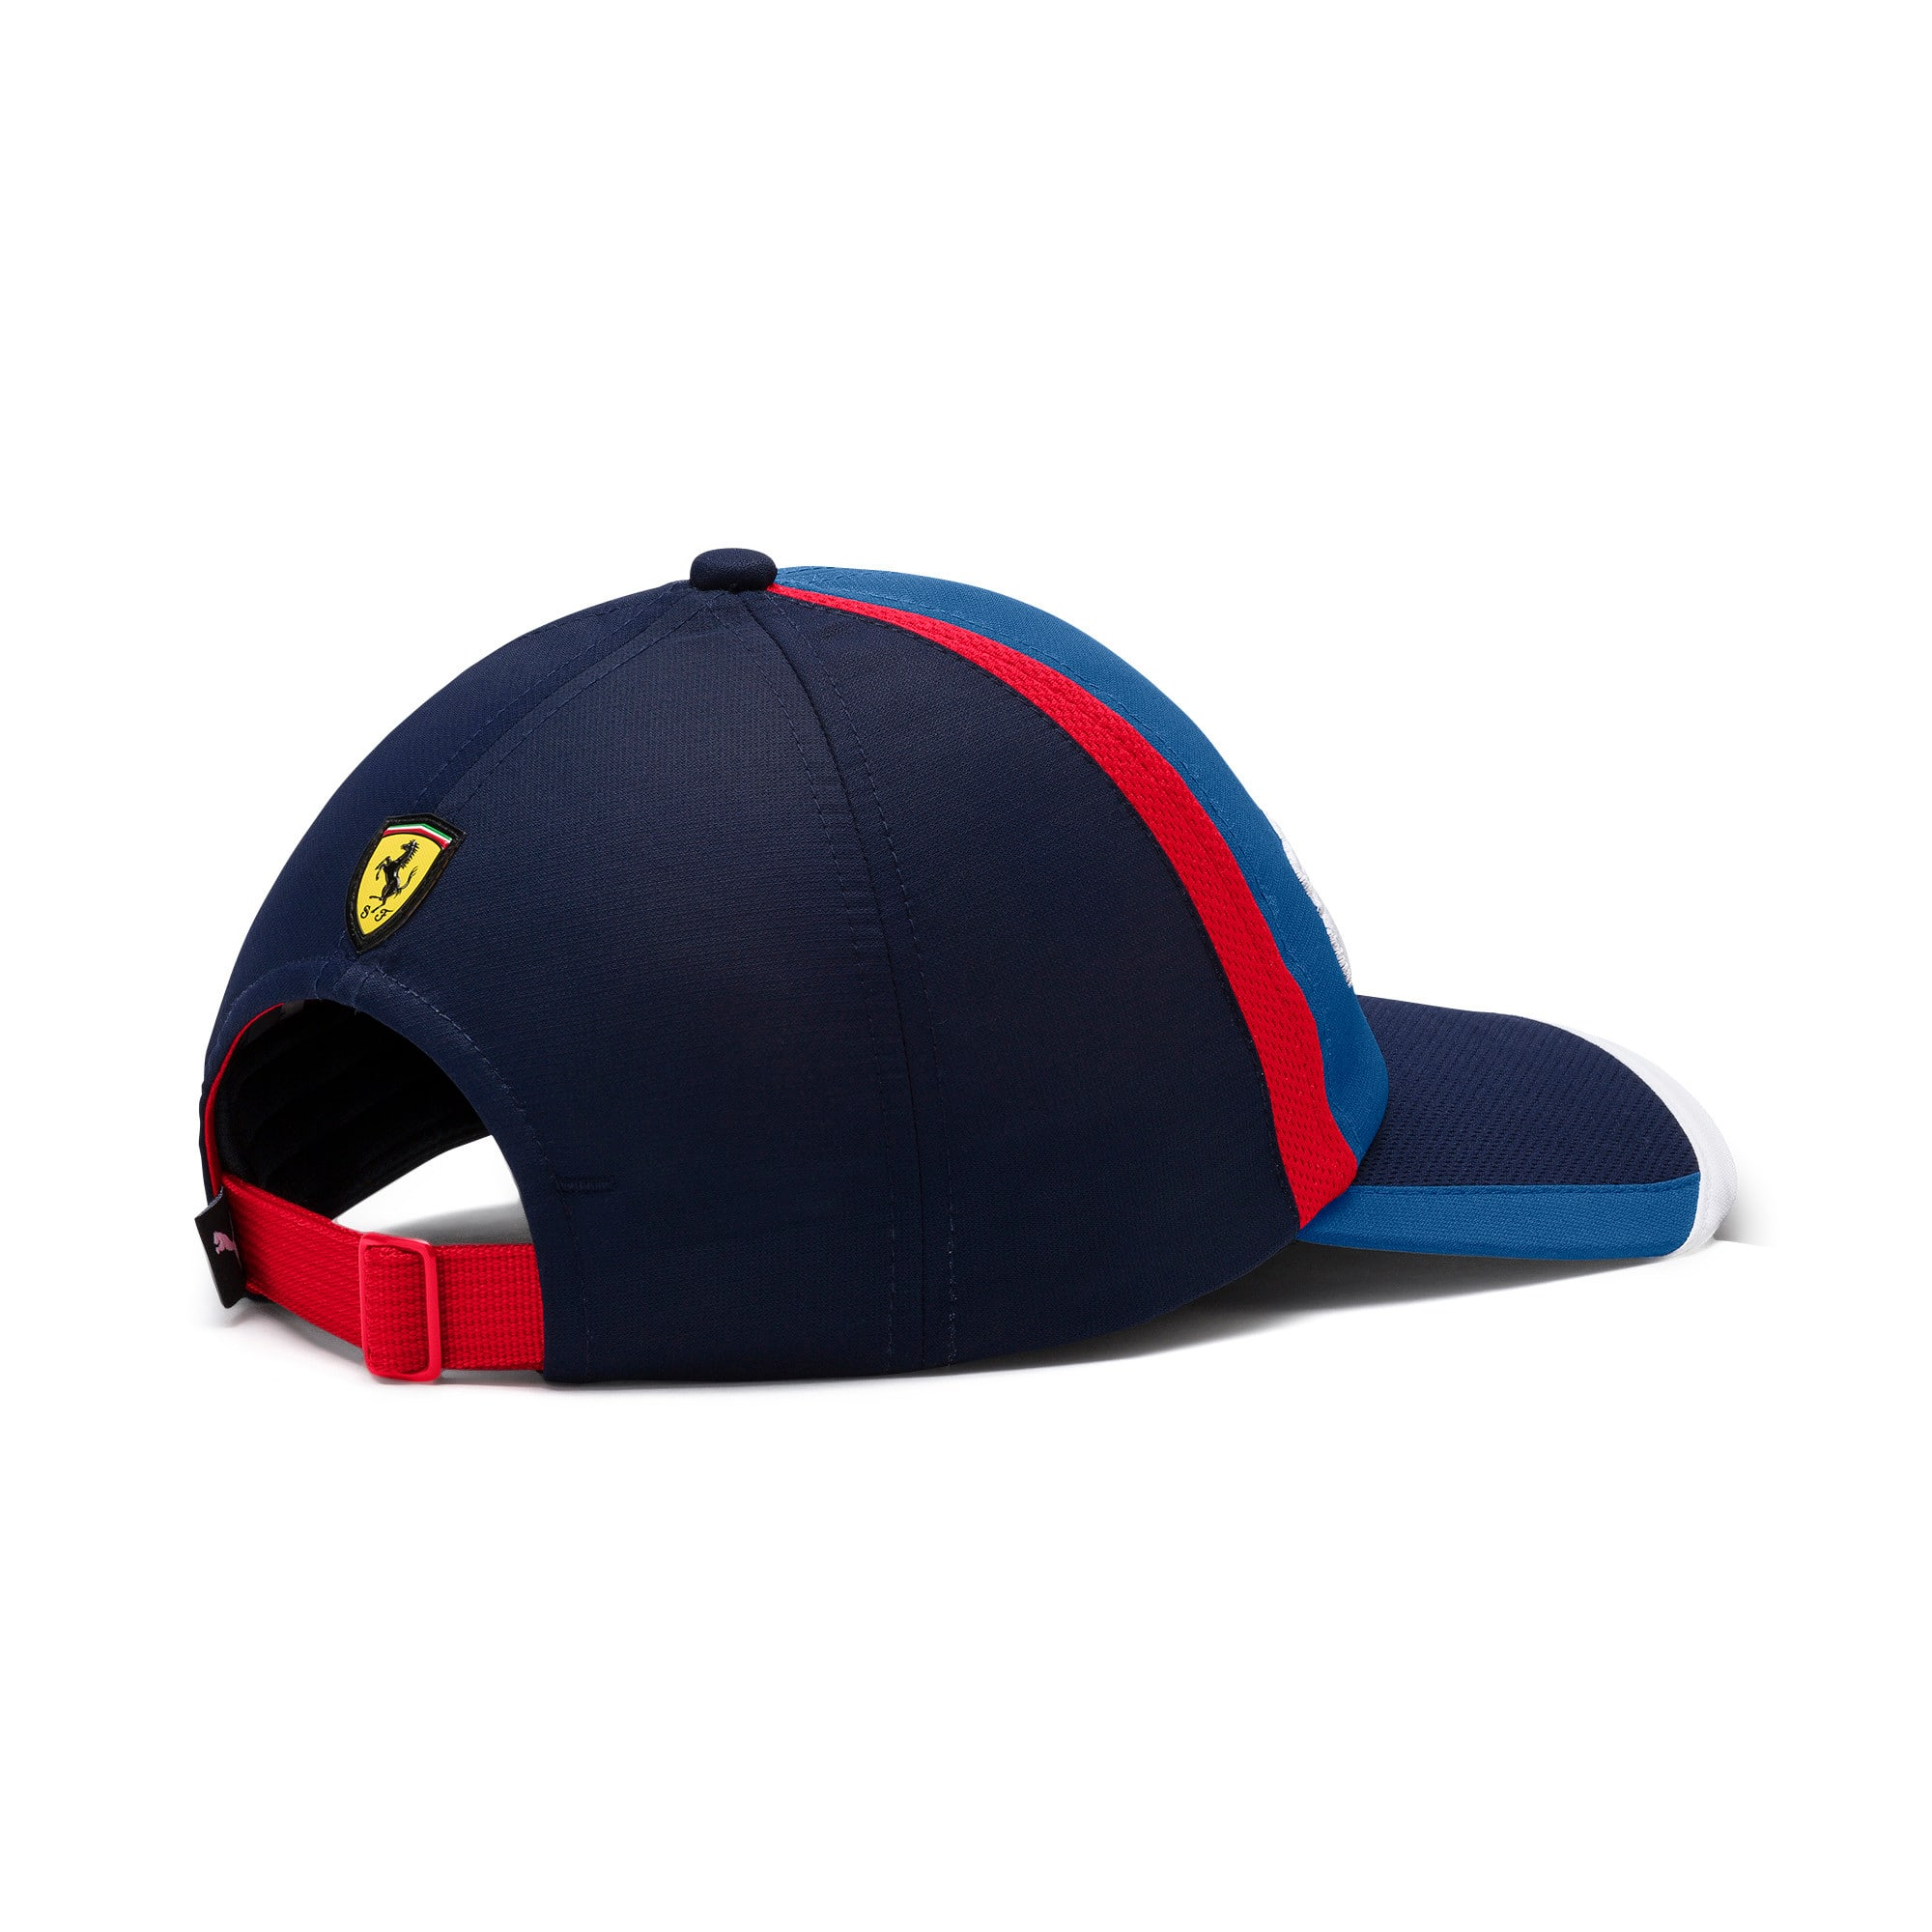 Thumbnail 3 of Ferrari Fanwear Cap, Galaxy Blue-Rosso Corsa, medium